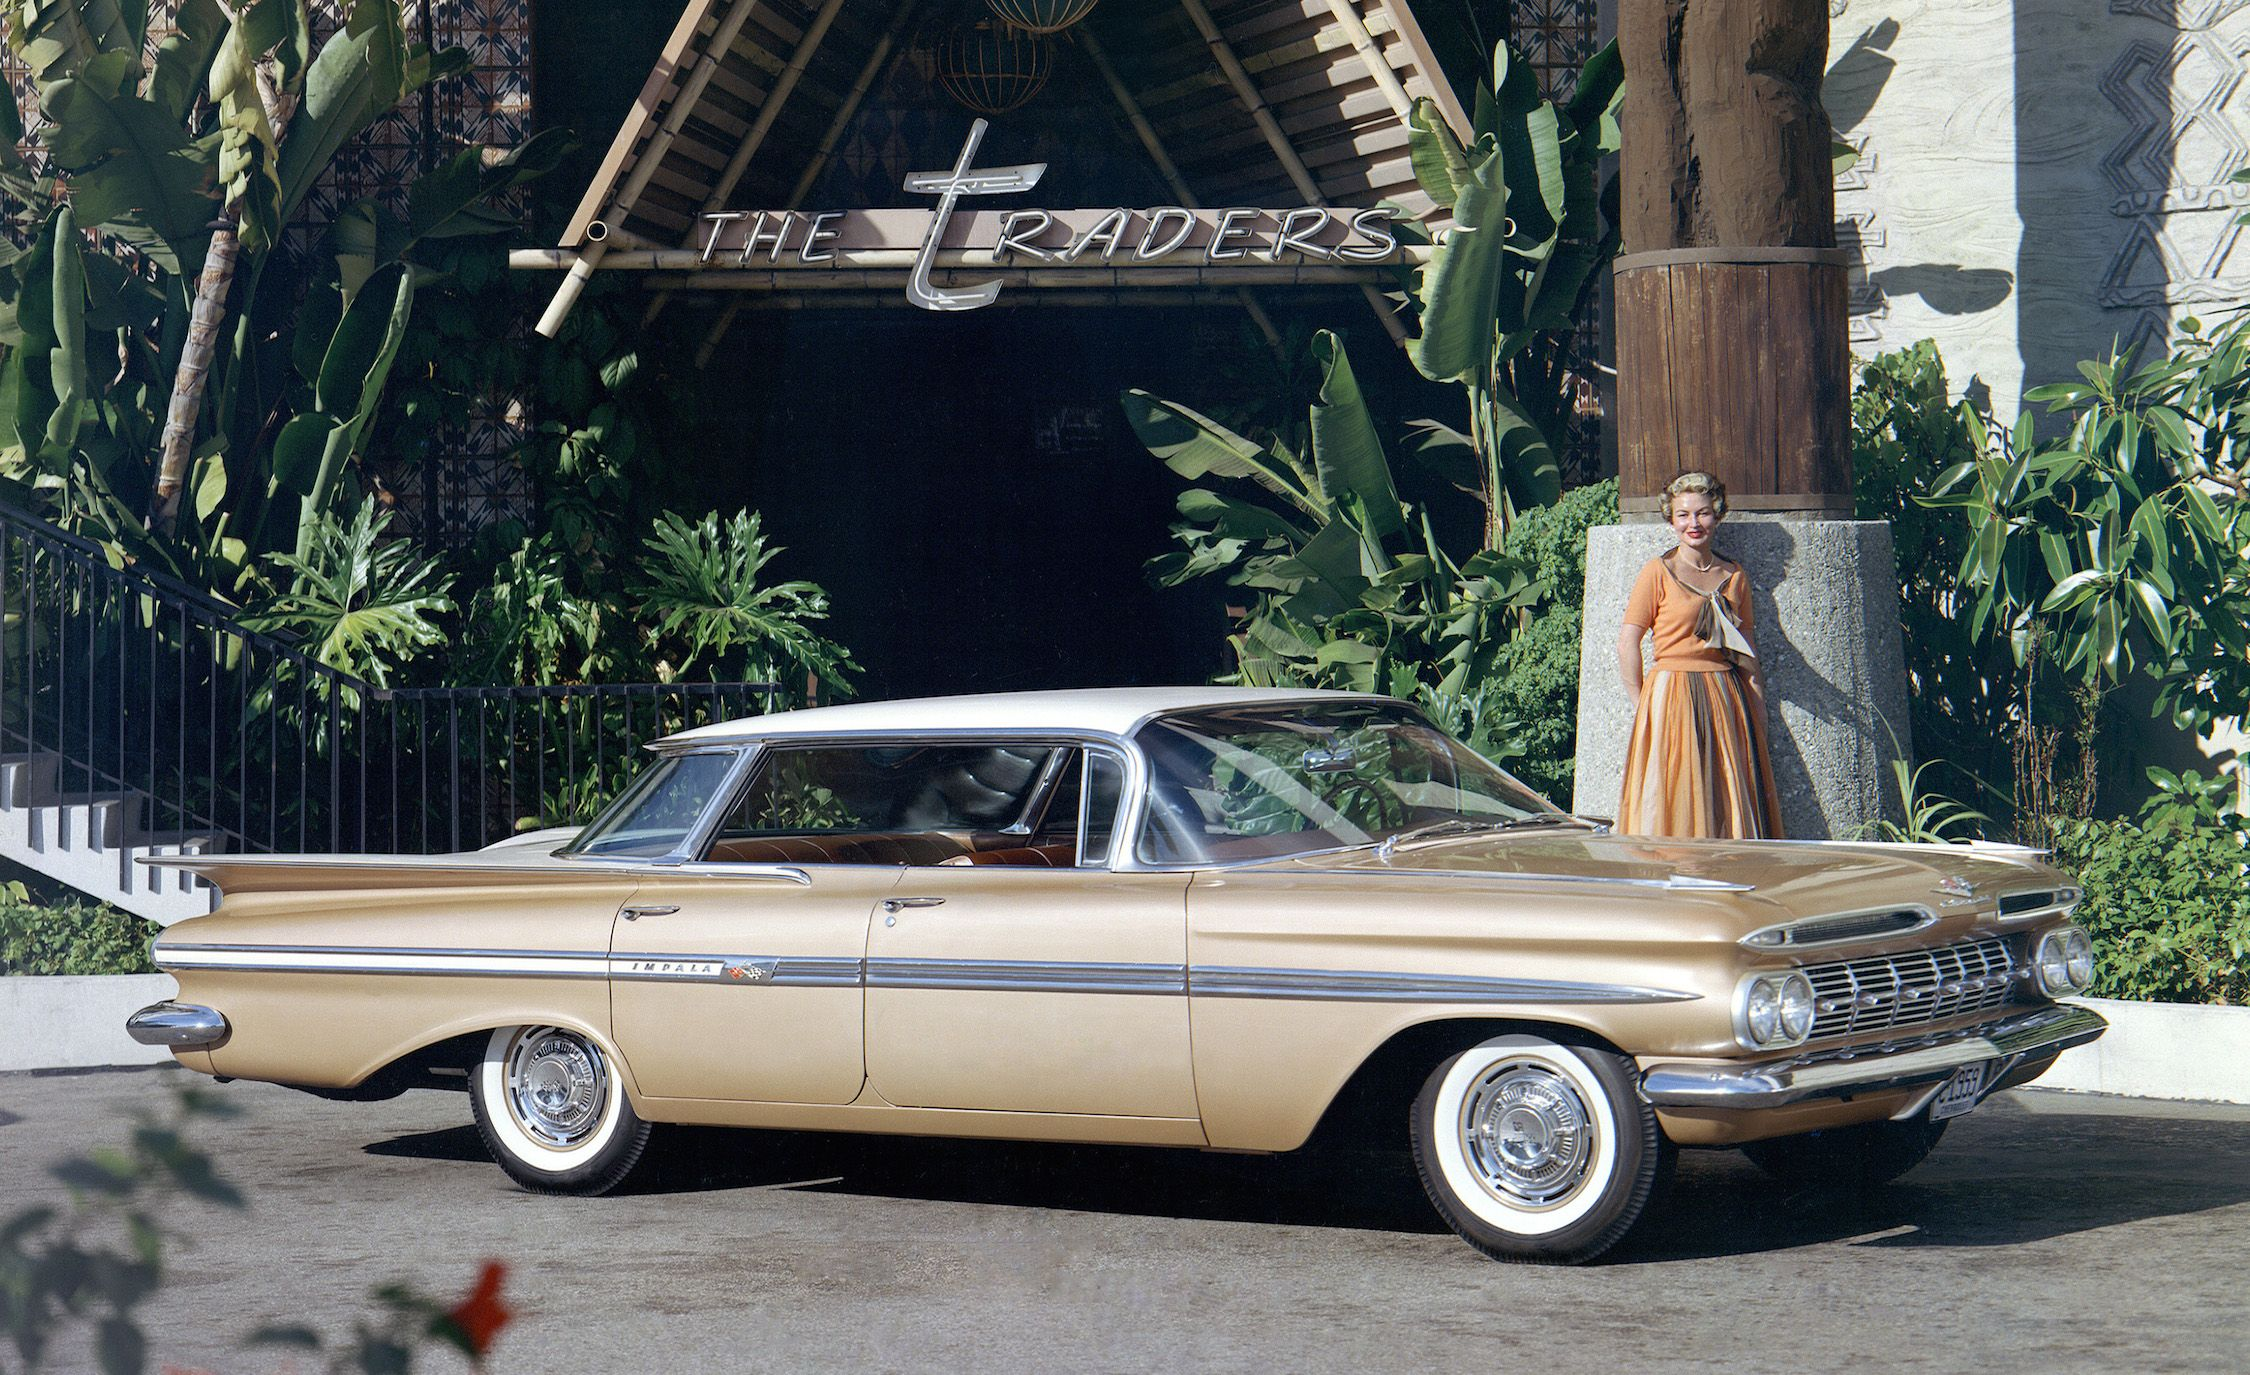 A Visual History Of The Chevrolet Impala